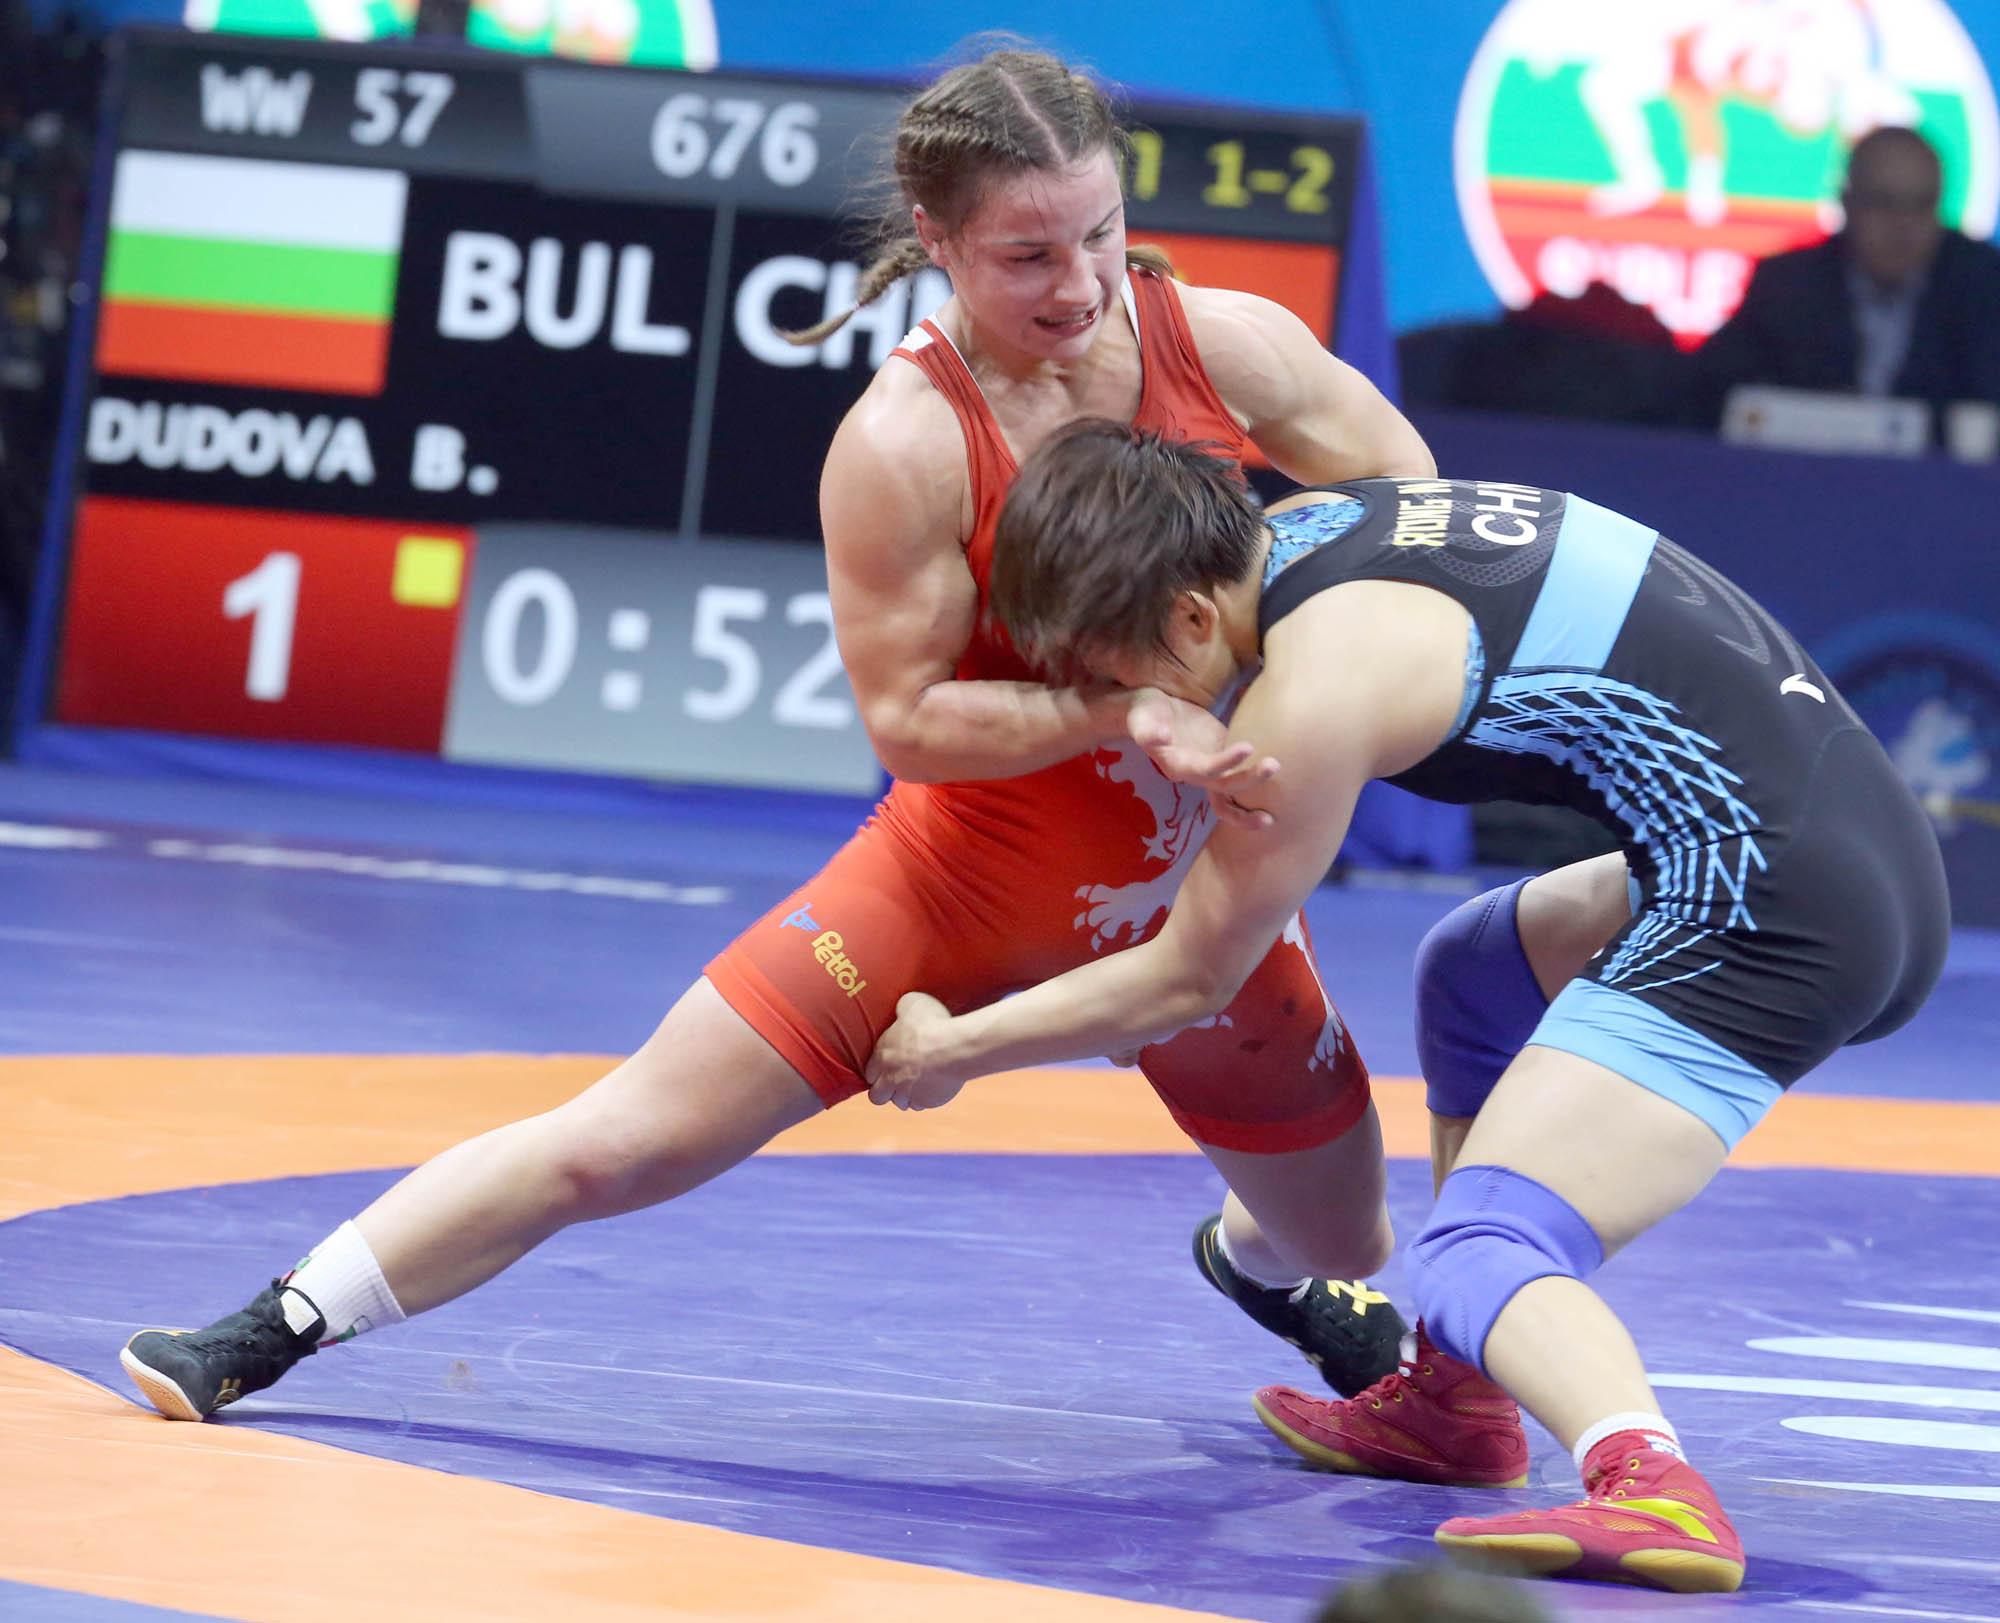 Биляна Дудова се бори за бронзов медал